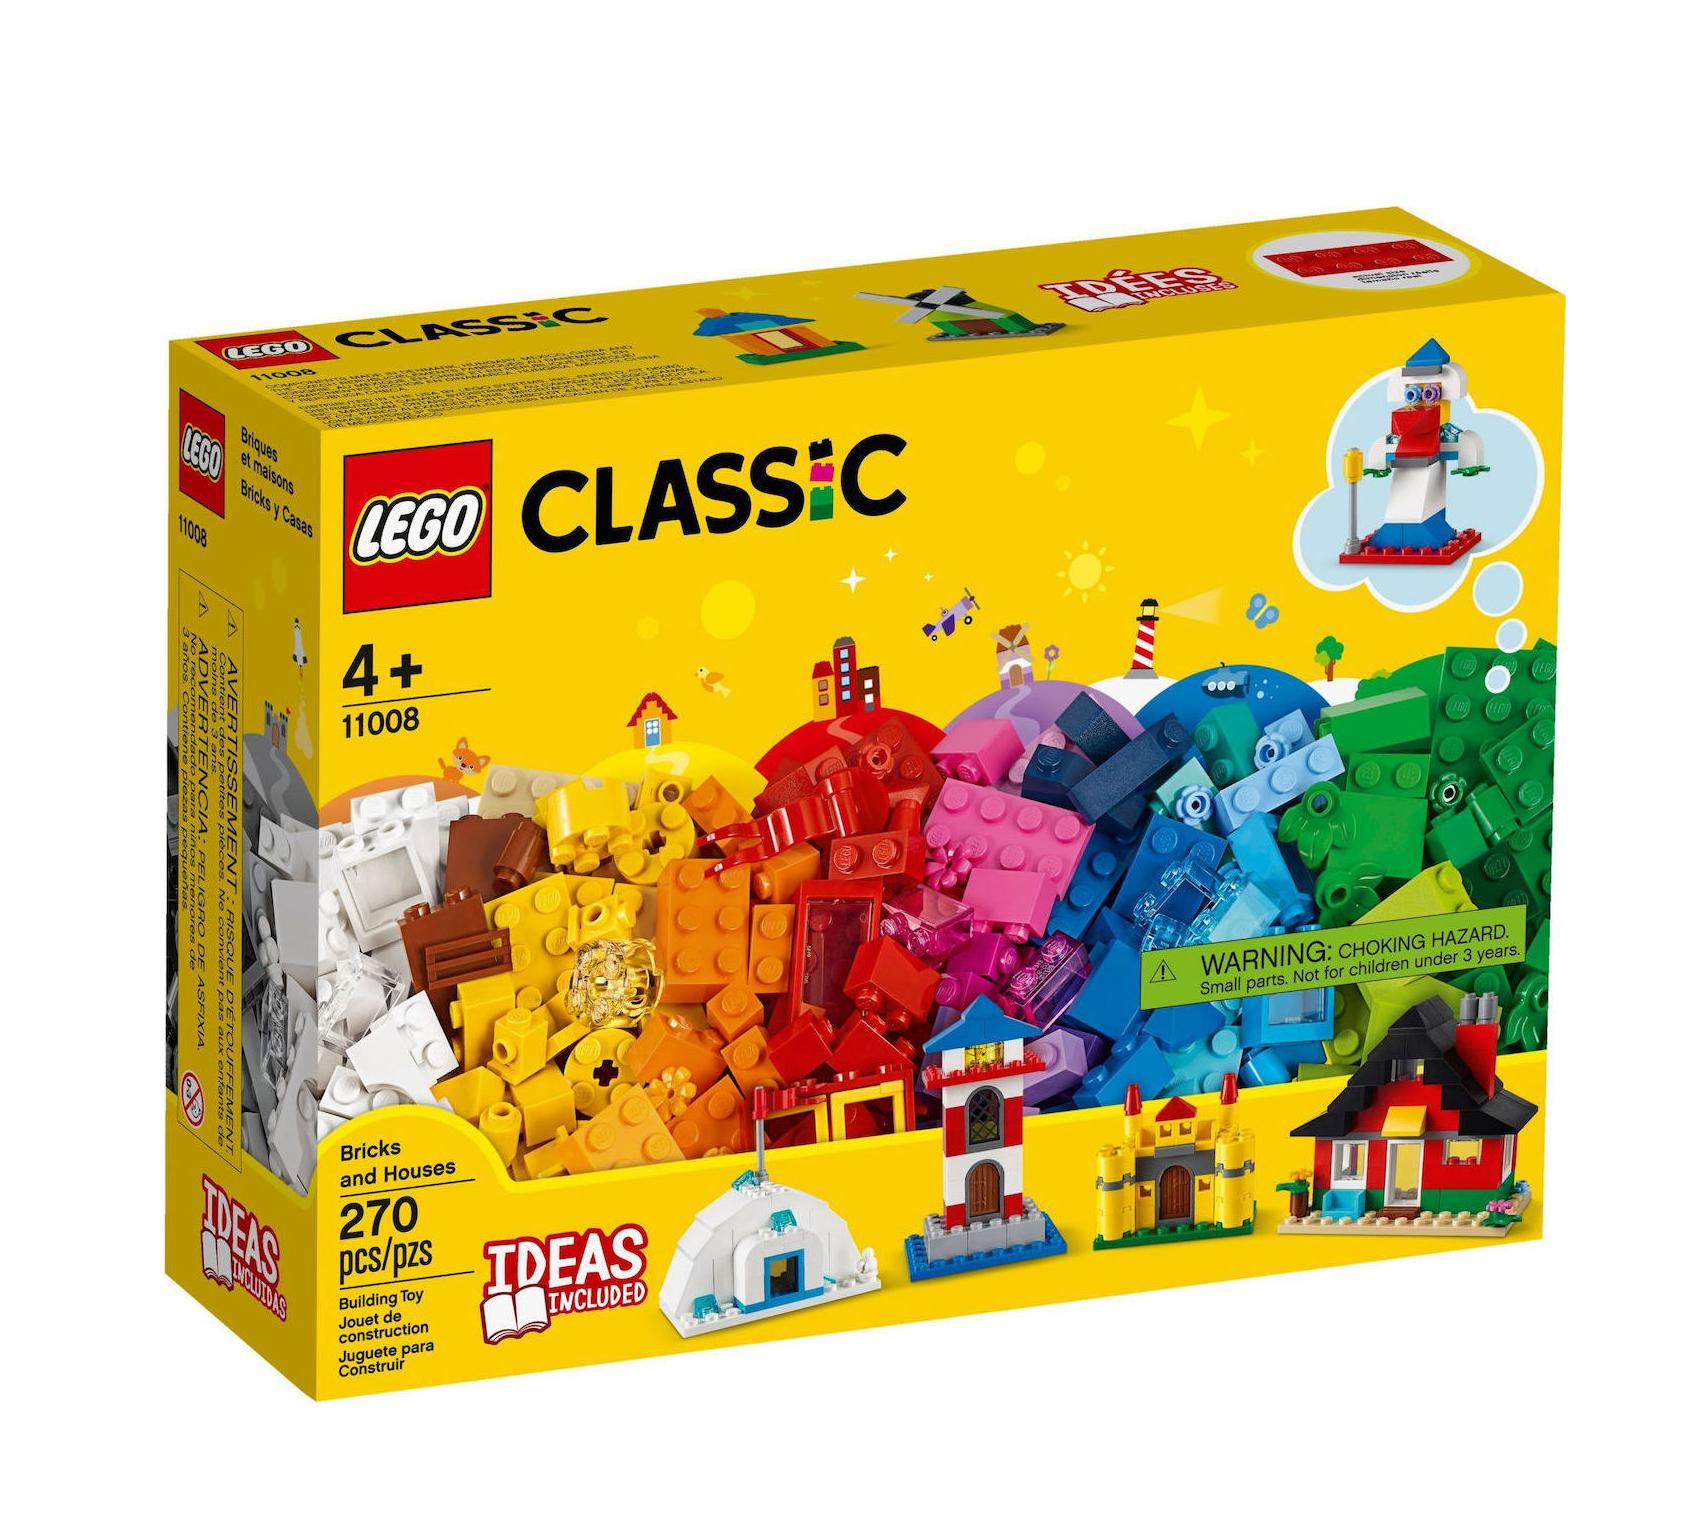 Lego Classic: Bricks & Houses 11008